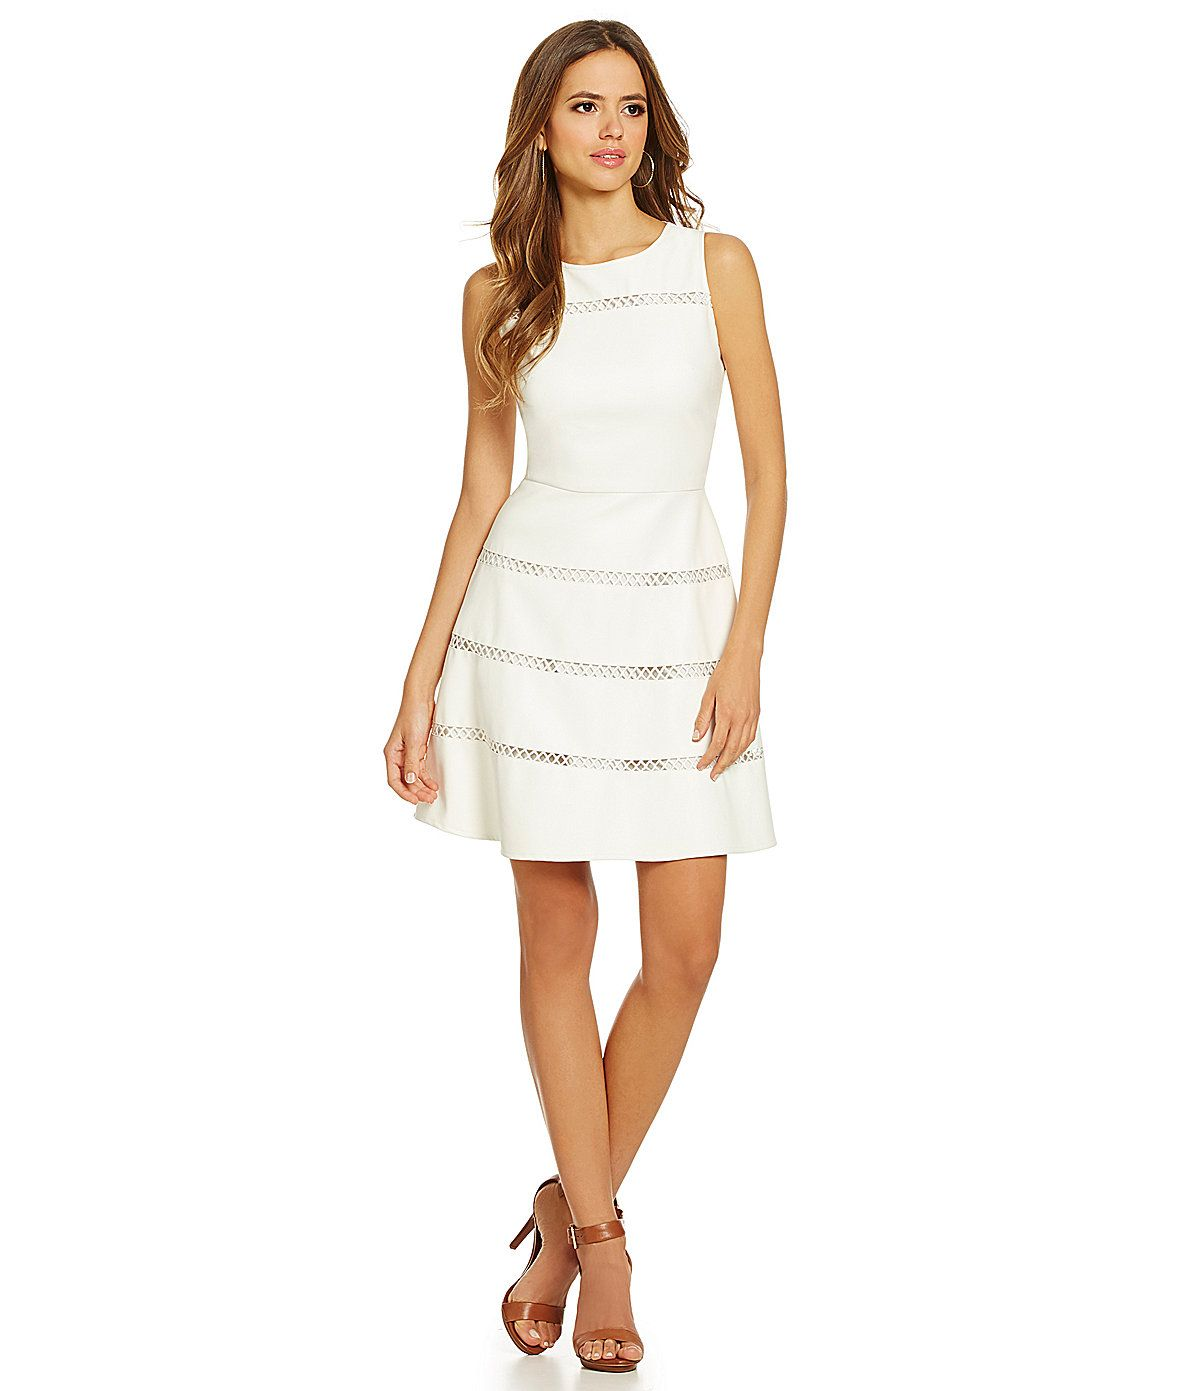 b2317baaa2b0 Gianni Bini Tera Crochet-Inset Faux-Leather A-Line Dress | Dillards.com